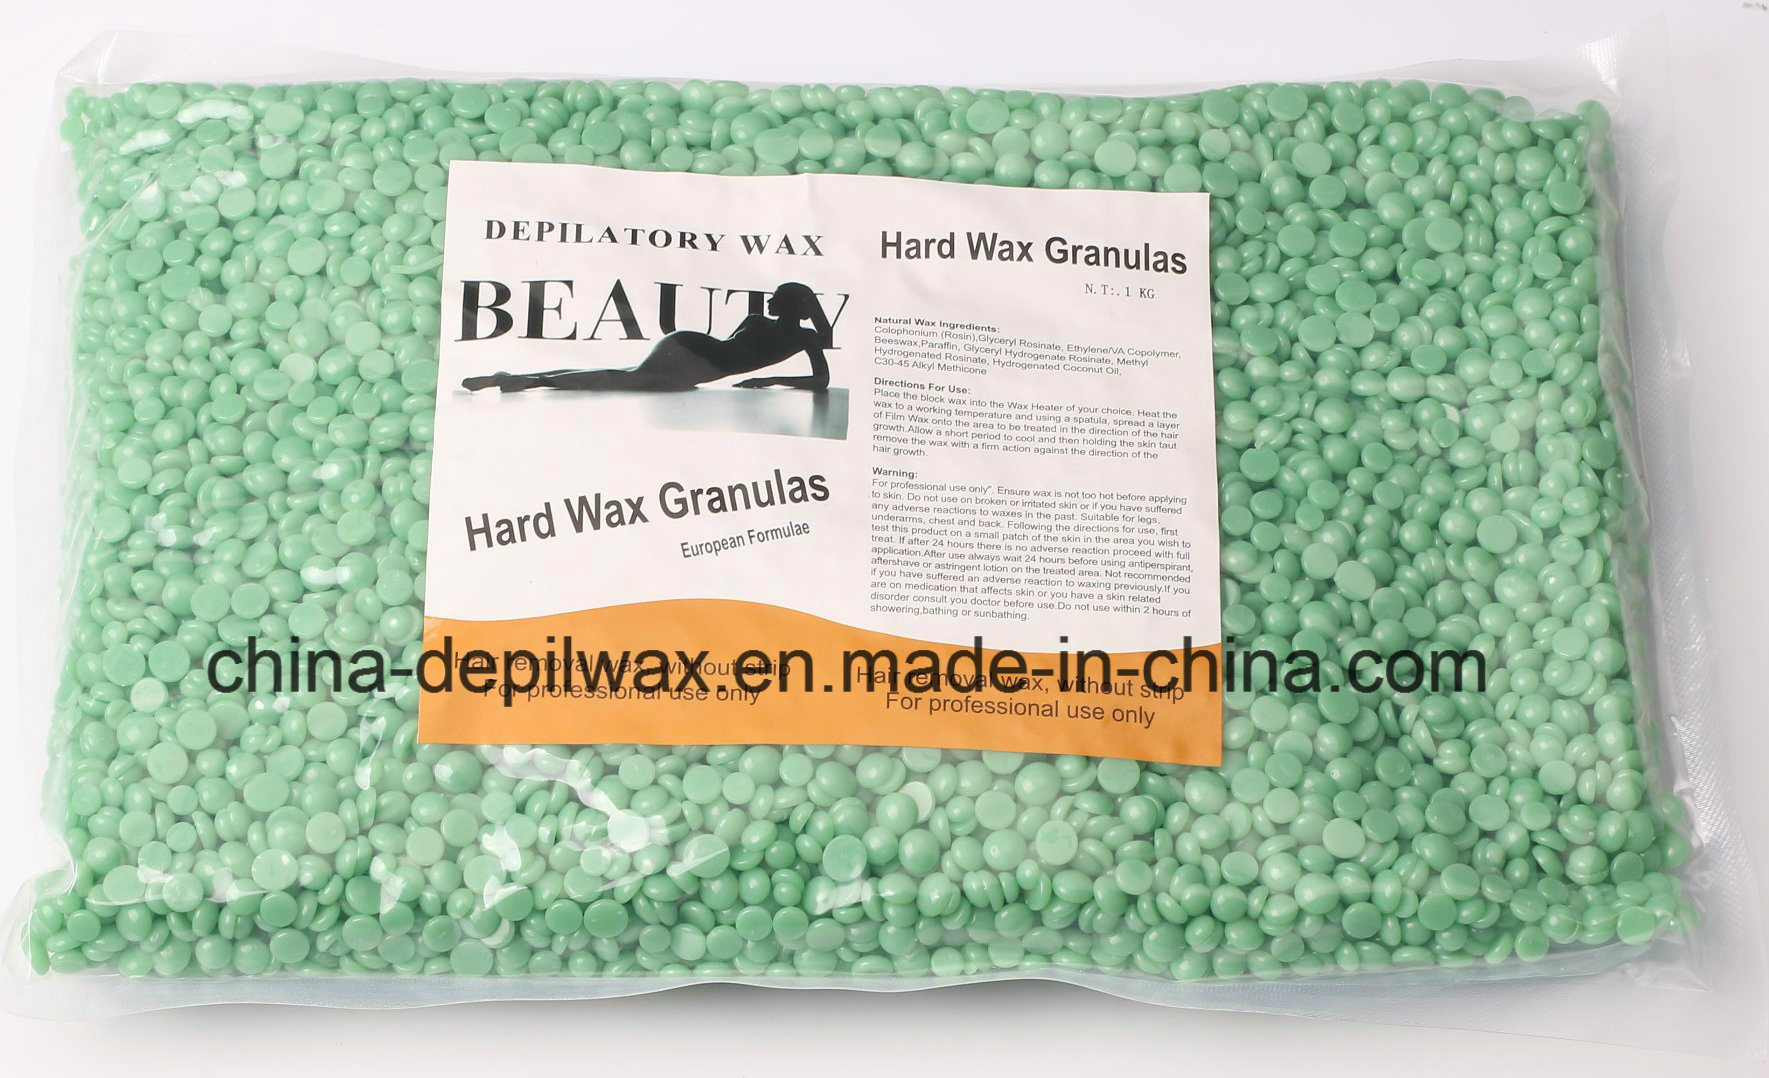 Red Hot Film Hard Wax Pellets Depilatory Wax for Stripless Waxing